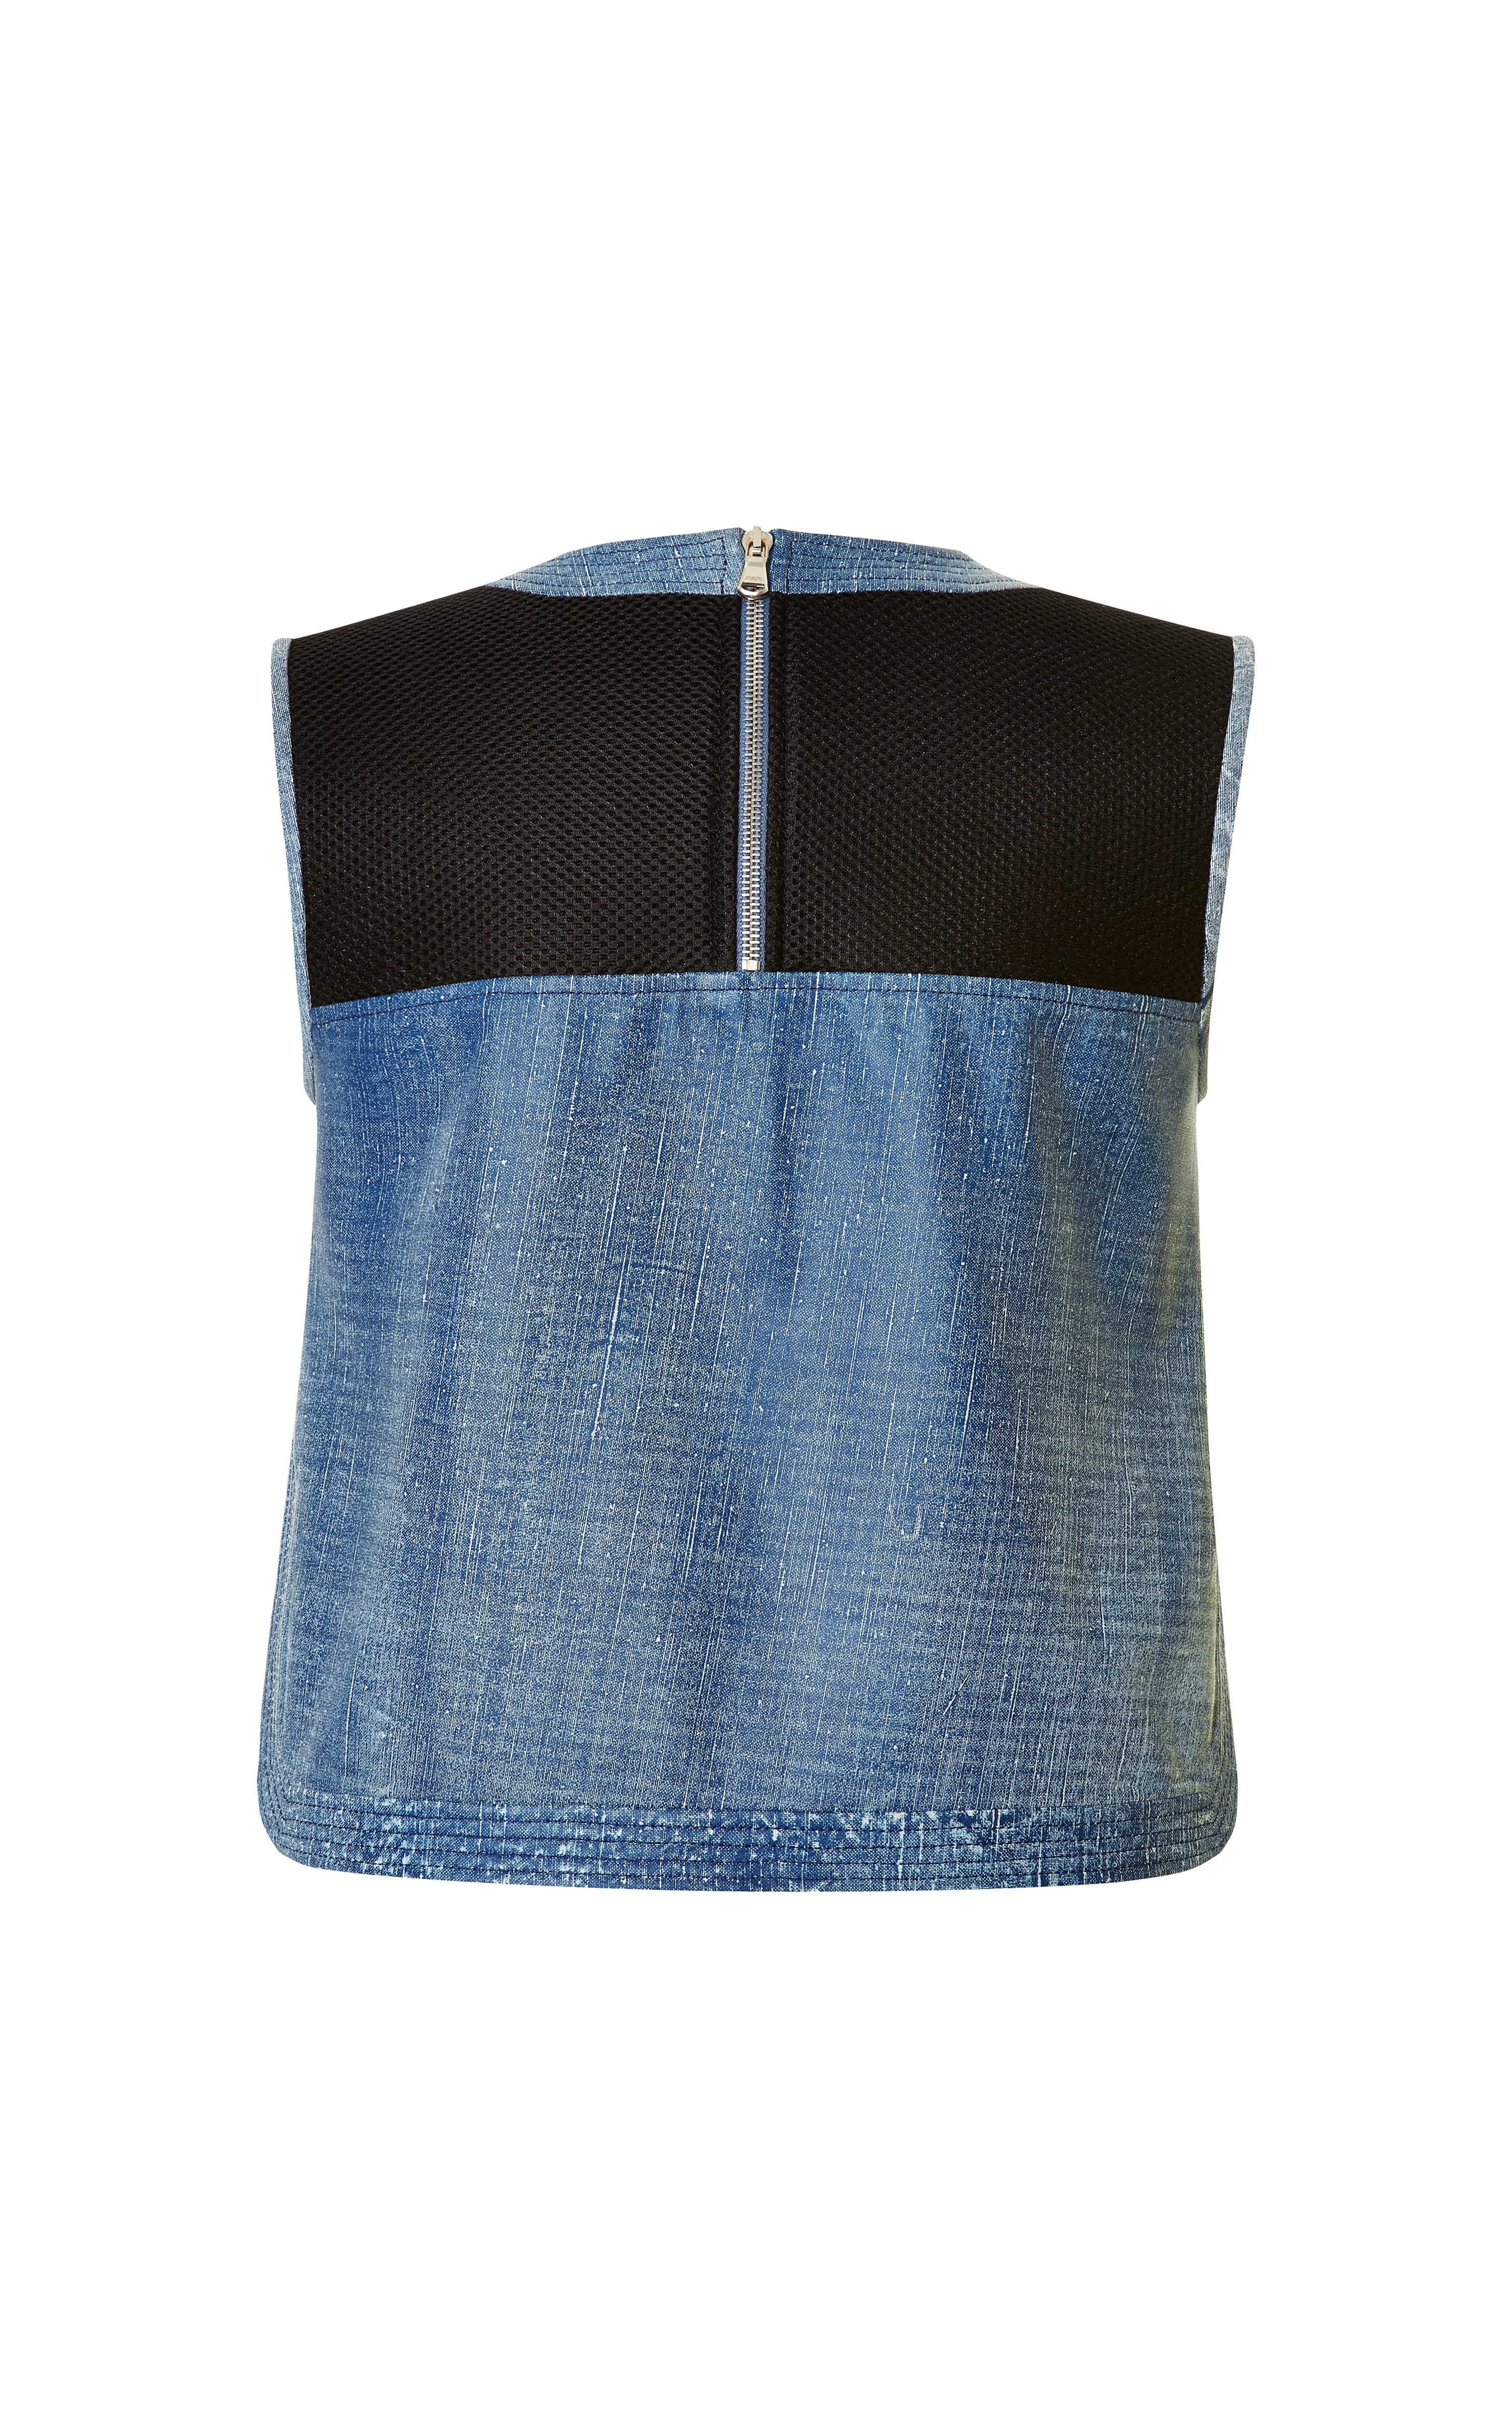 veronica beard denim leather crop top in blue lyst. Black Bedroom Furniture Sets. Home Design Ideas